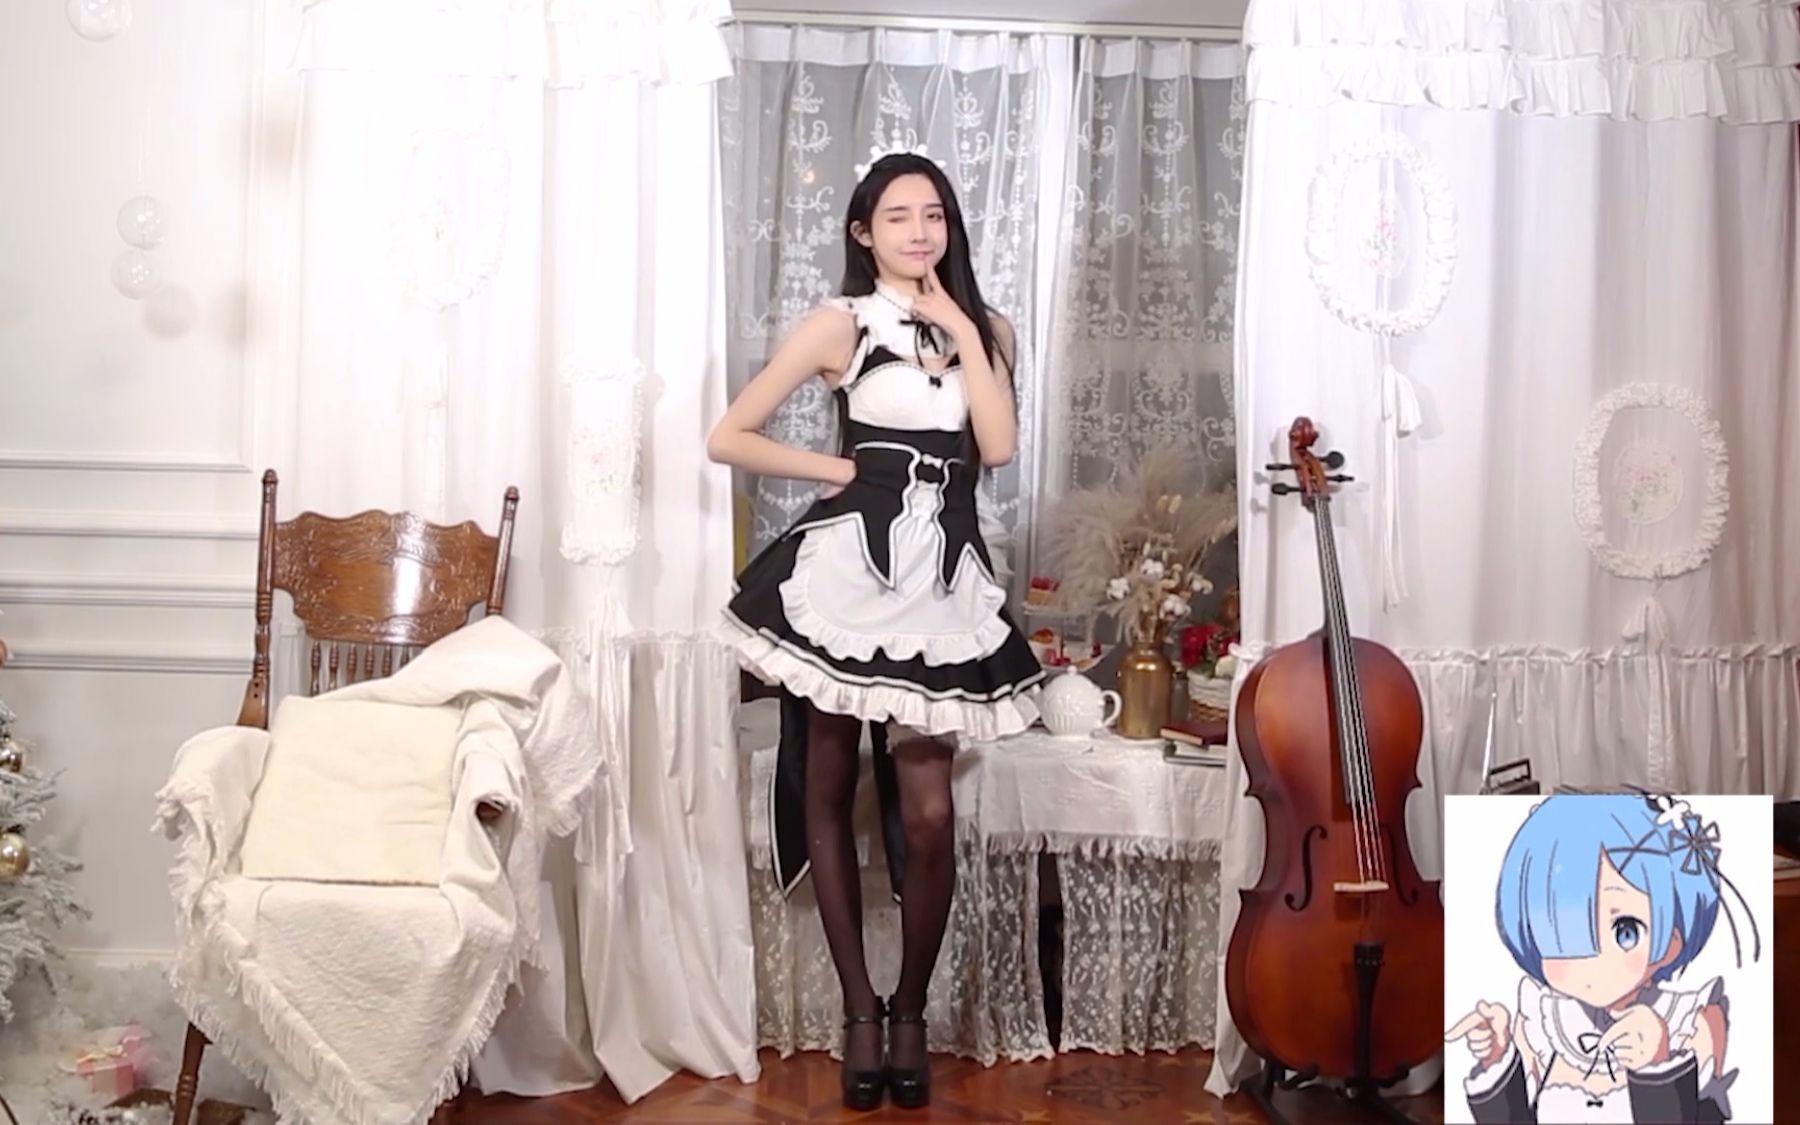 【Abbily艾比】黑 丝 福 利  二次元女仆辣舞放送 (秘)